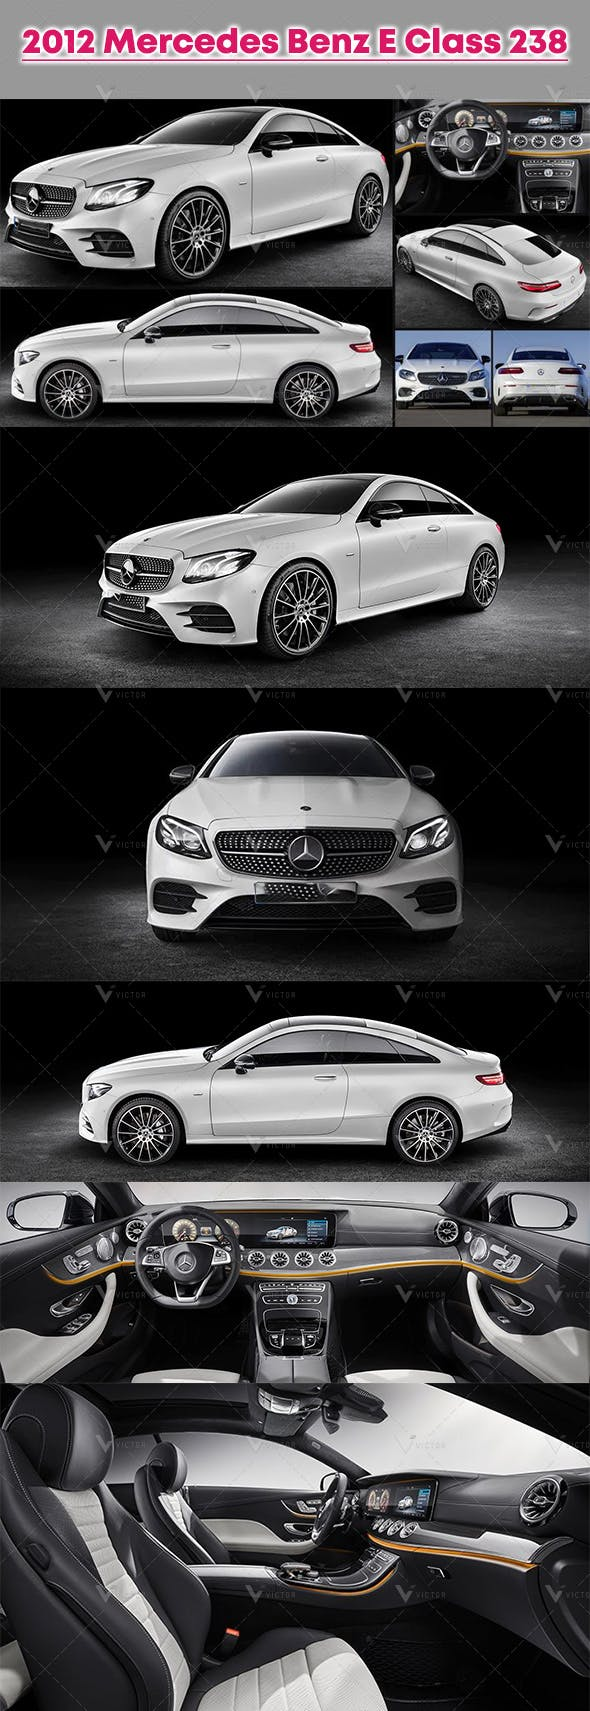 2012 Mercedes Benz E Class 238 - 3DOcean Item for Sale